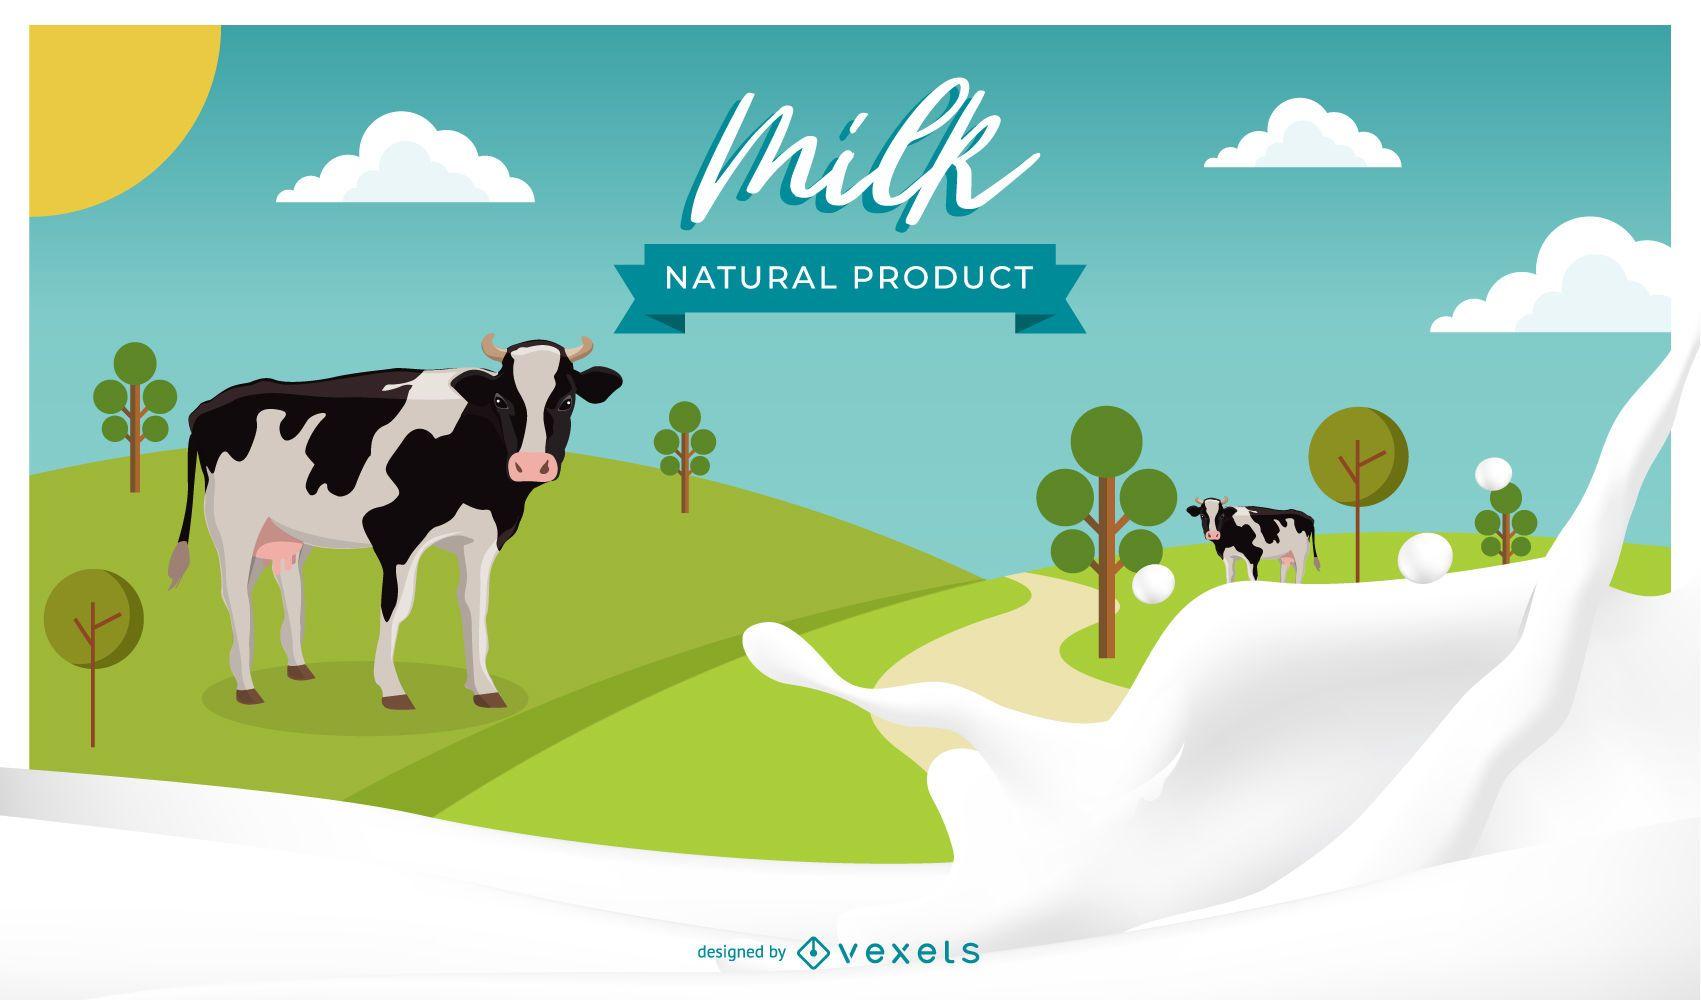 Milk Natural Product Illustration